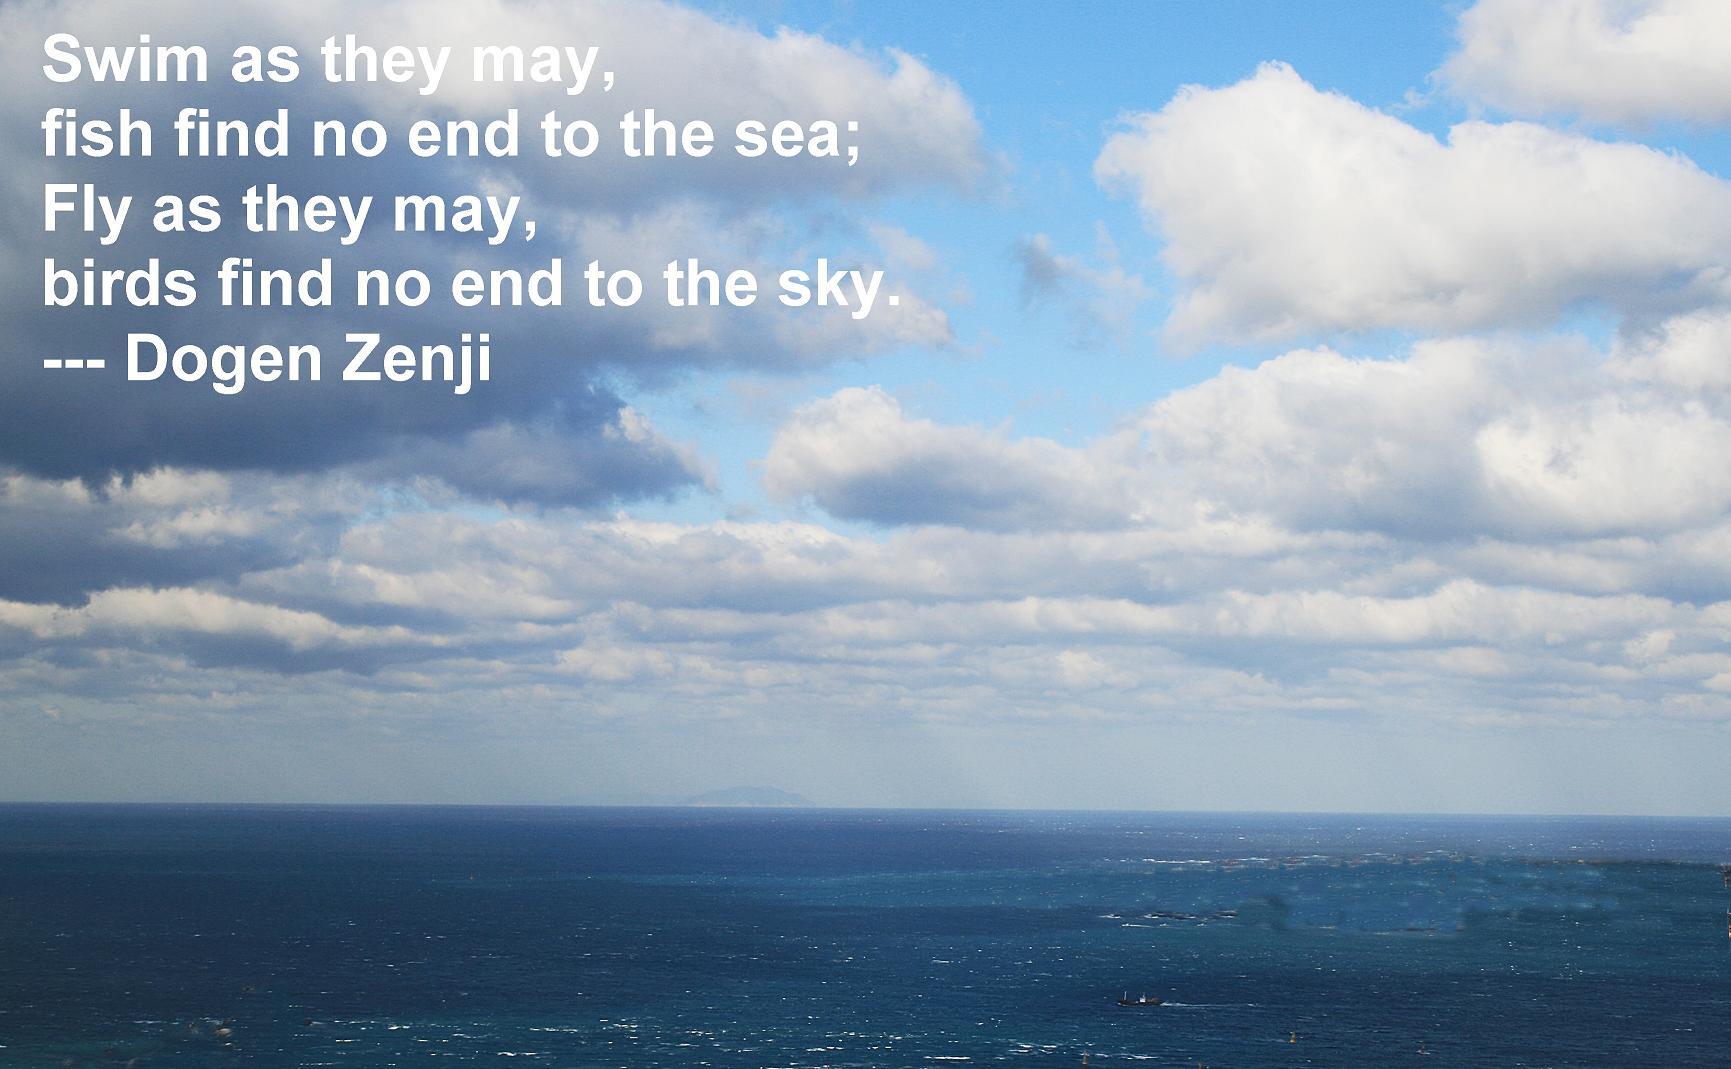 Dogen Zenji's quote #3